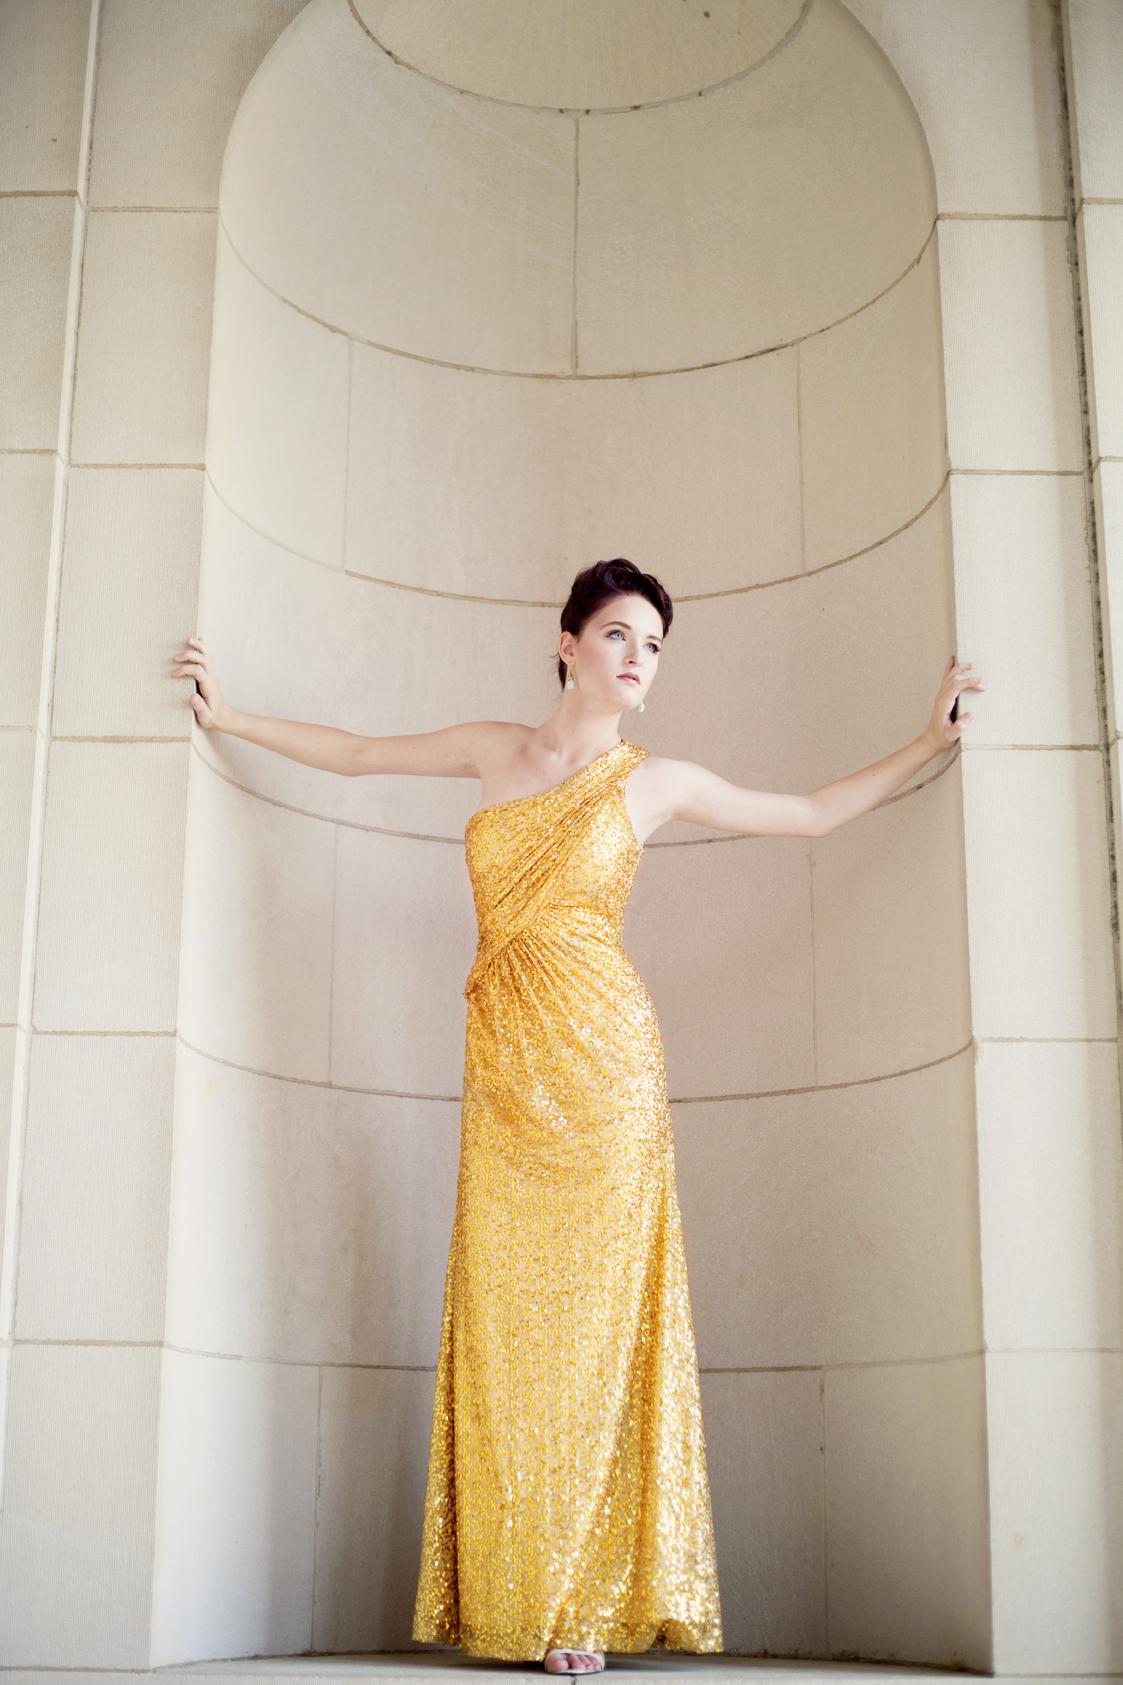 Consignment evening gowns richmond va flower girl dresses for Consignment wedding dresses richmond va